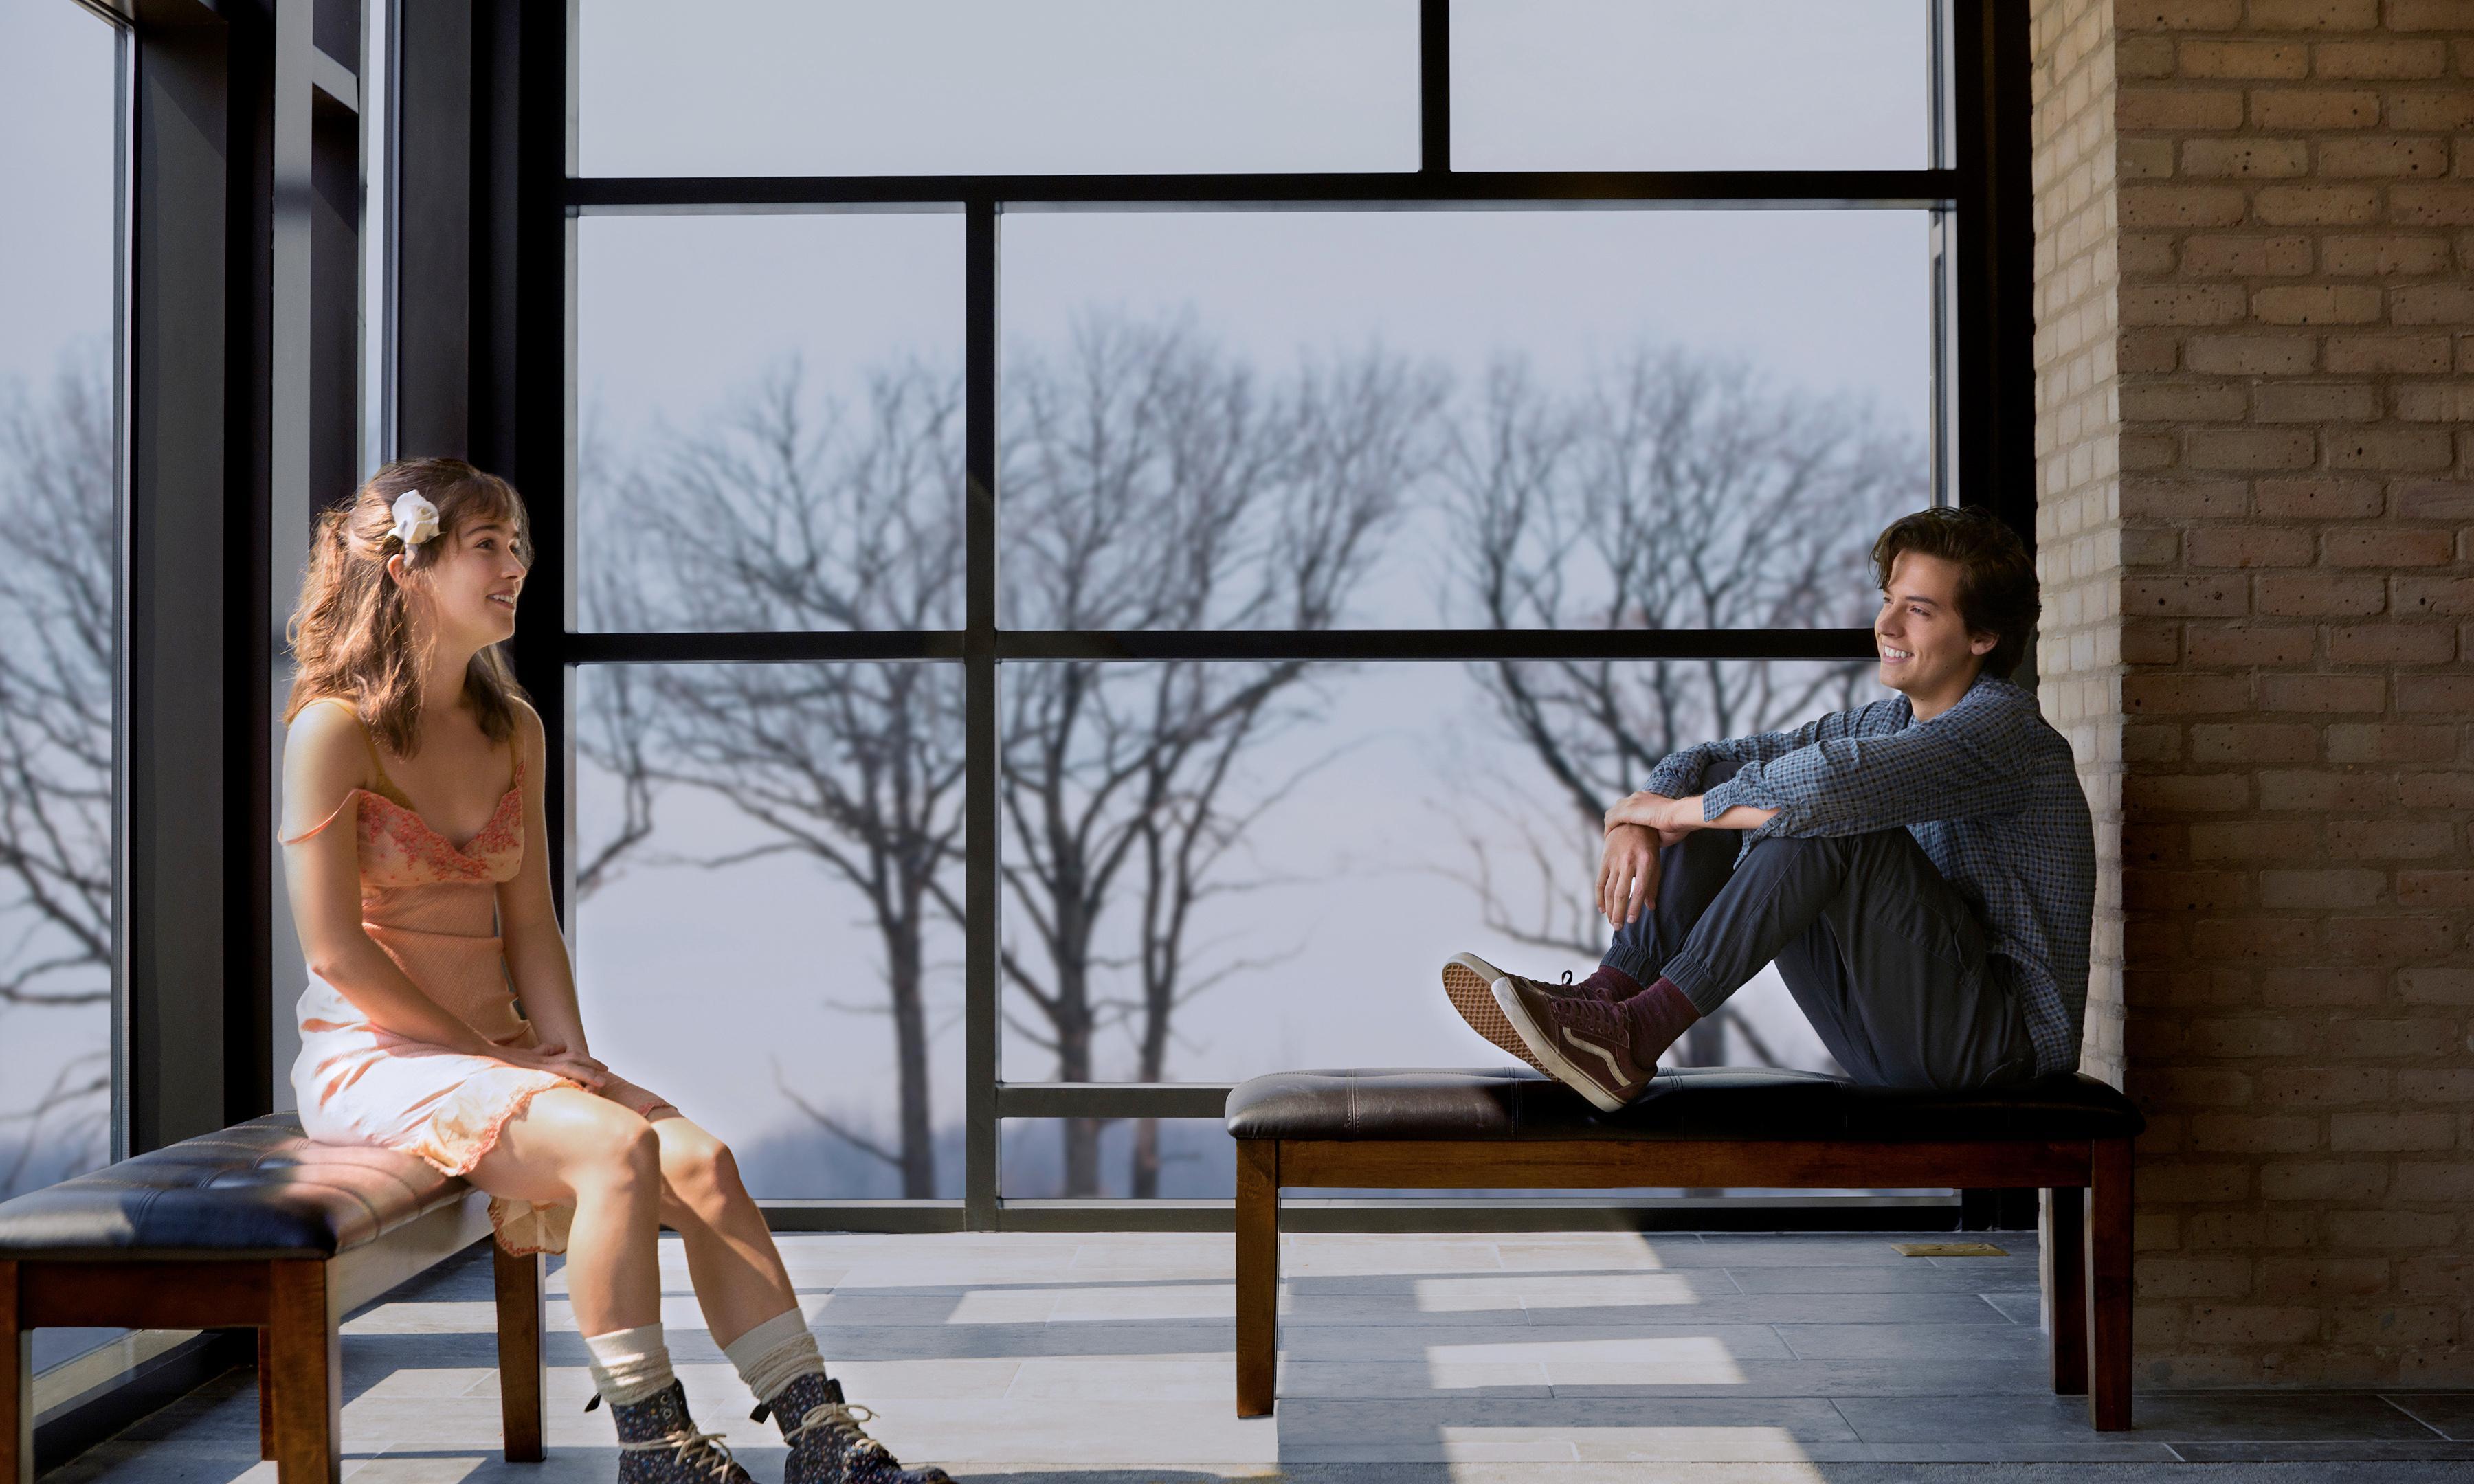 Five Feet Apart review – sickly teen romance dies a slow death